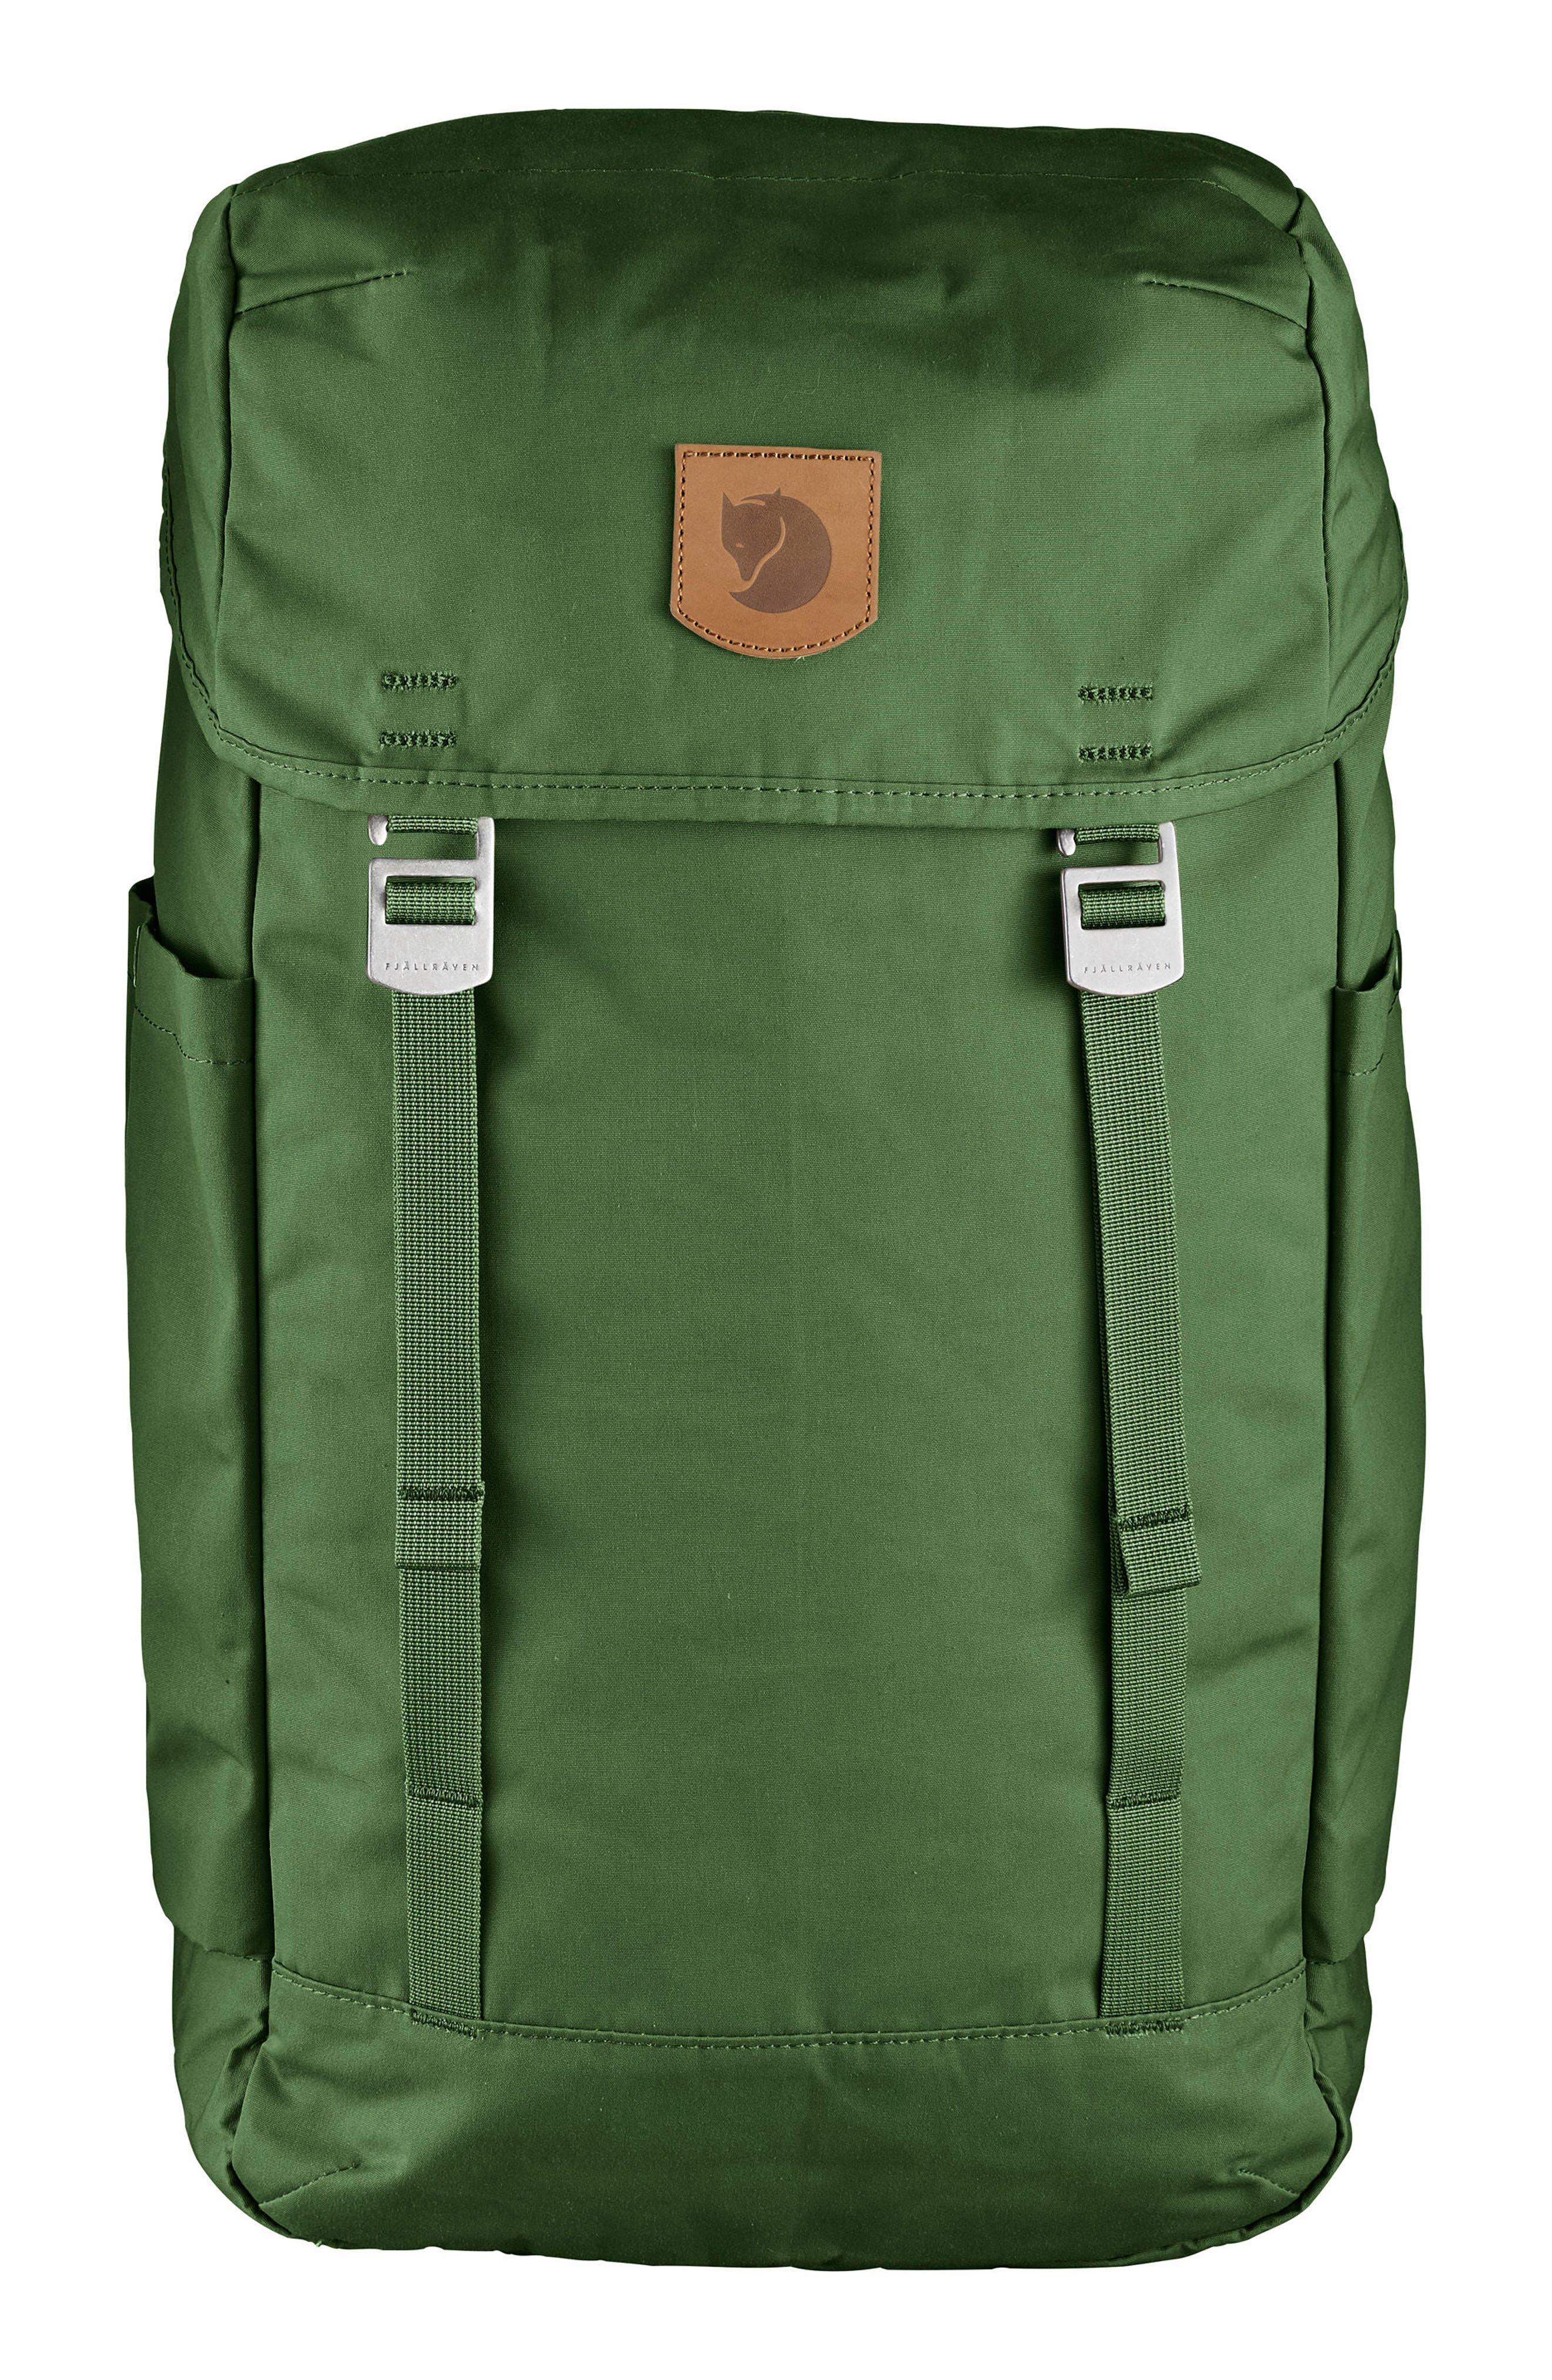 Greenland Large Backpack,                         Main,                         color, FERN